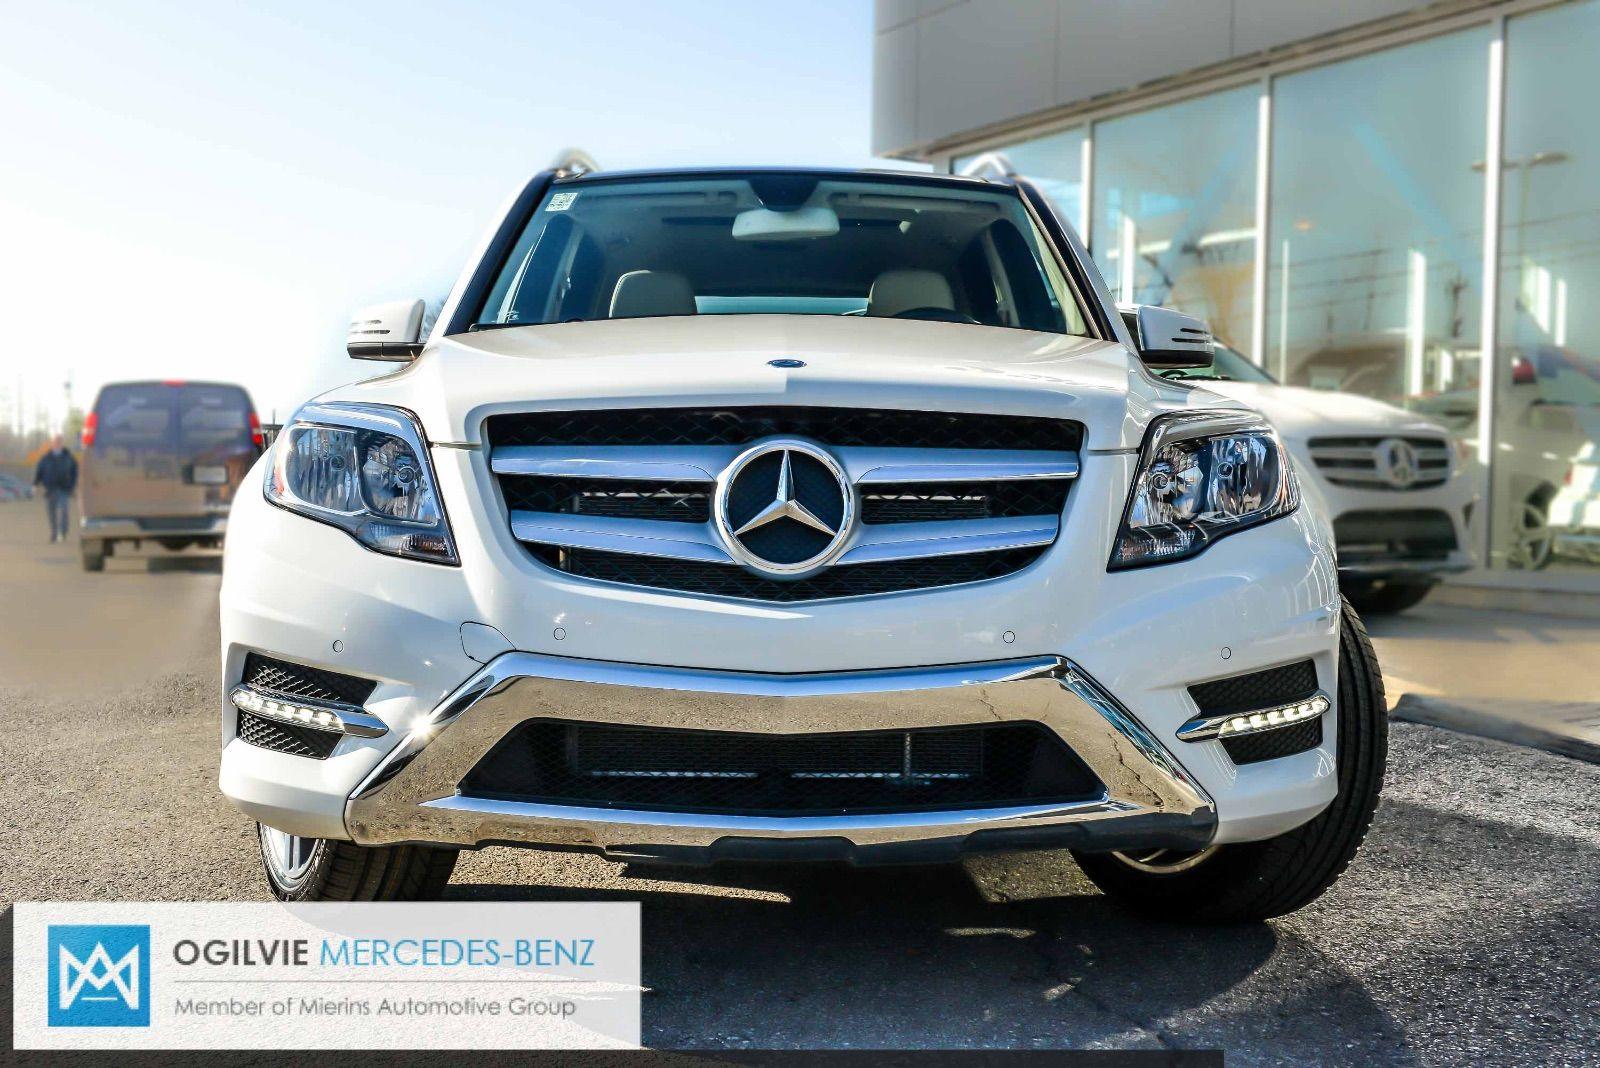 Pre owned 2013 mercedes benz glk350 4matic in ottawa for Mercedes benz glk350 accessories